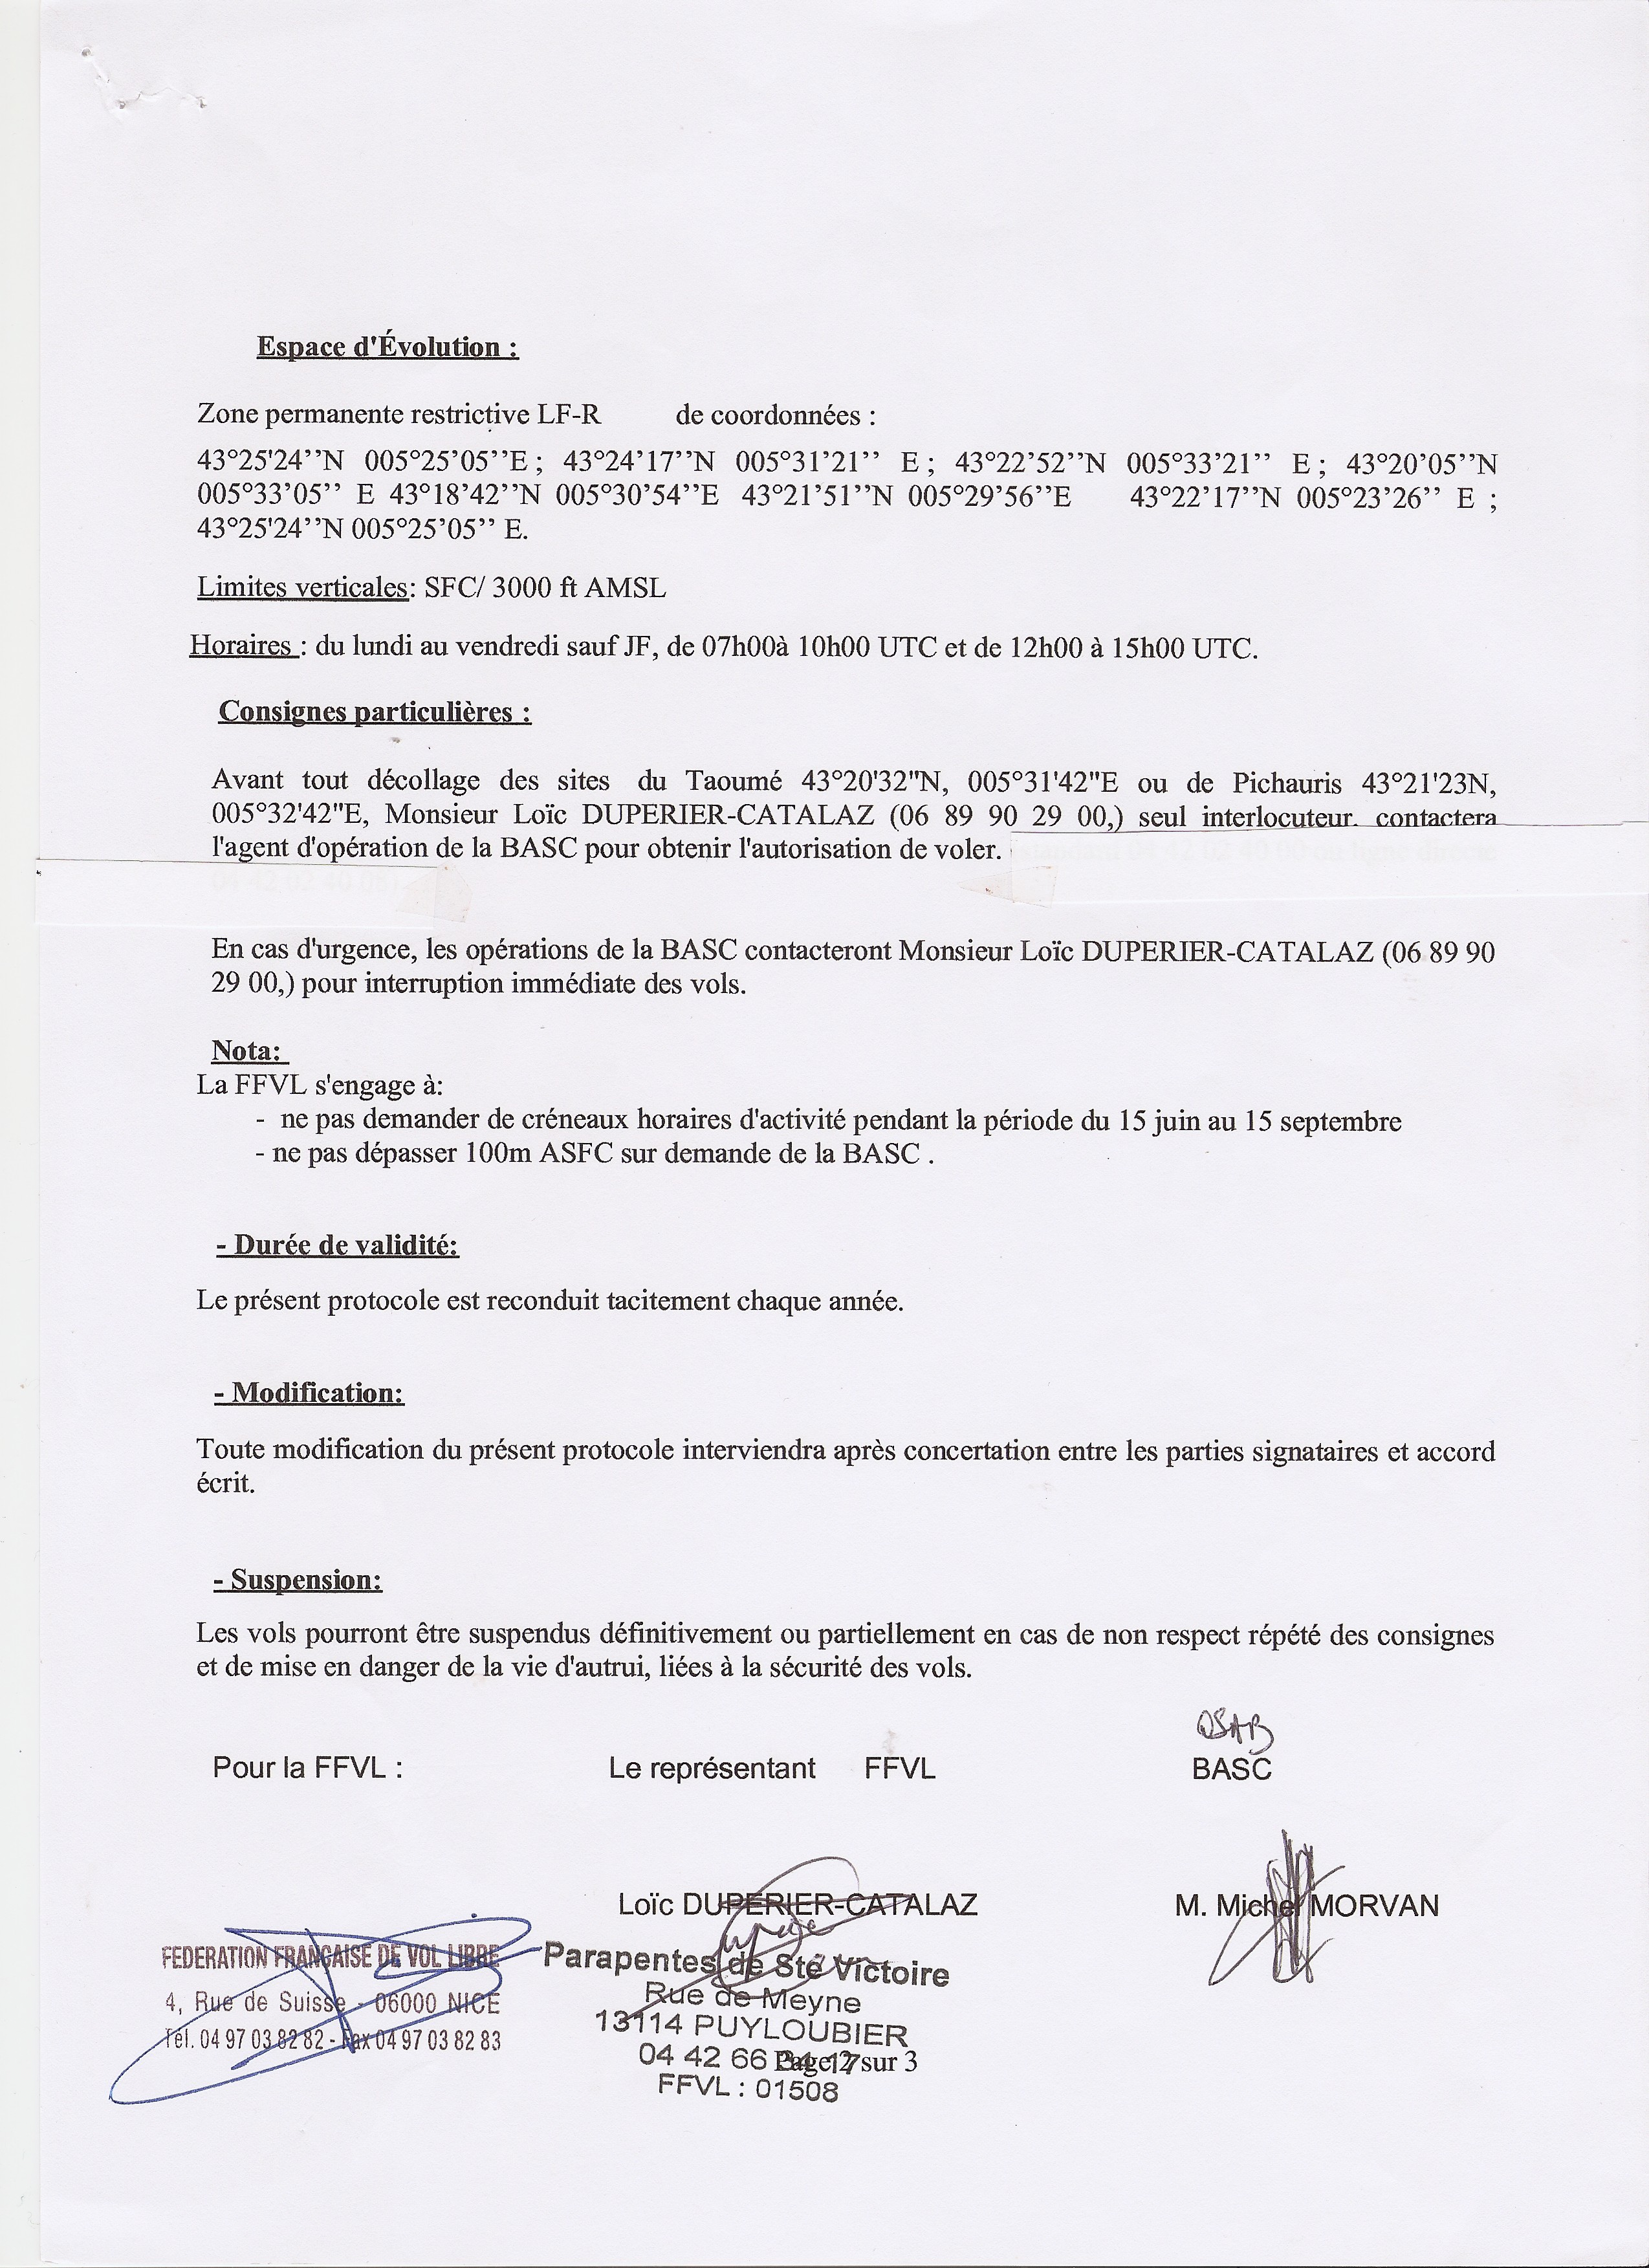 http://loicduperier.free.fr/parapente_blog/Lettre%20d%27accord%20BASC%201%20bis.jpg